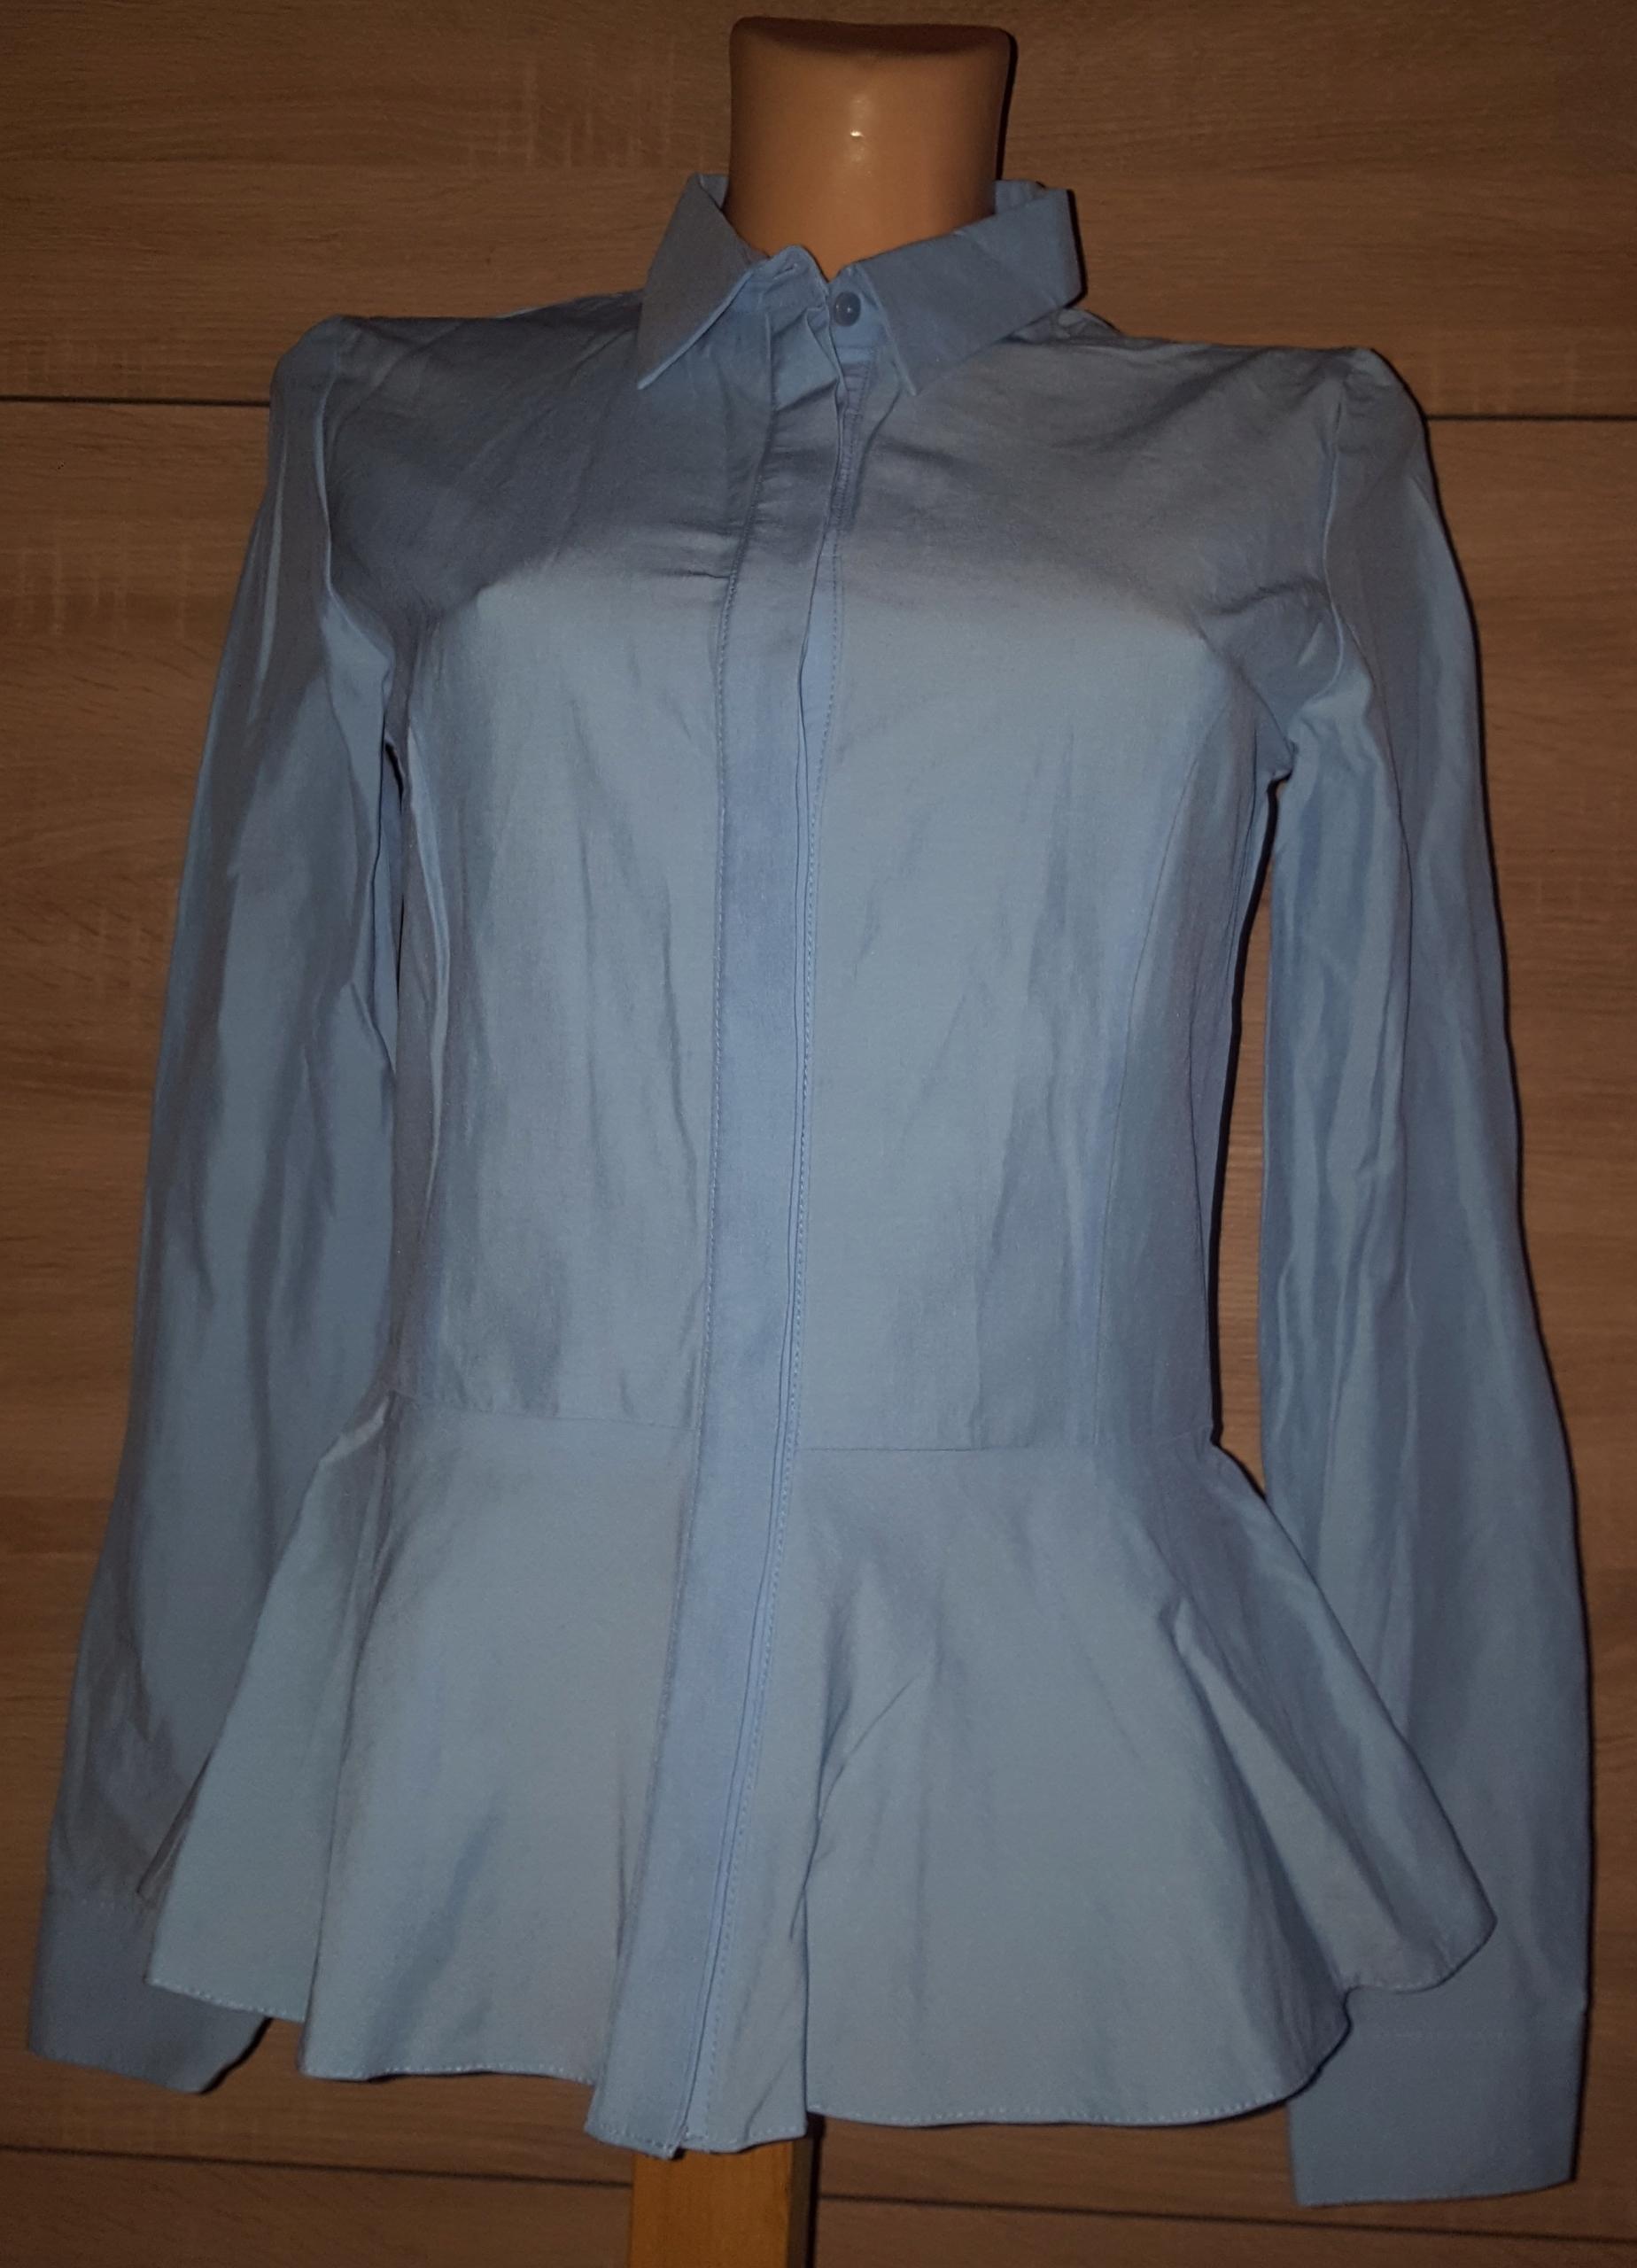 Bluzka damska koszulowa PERSO rozmiar 36.